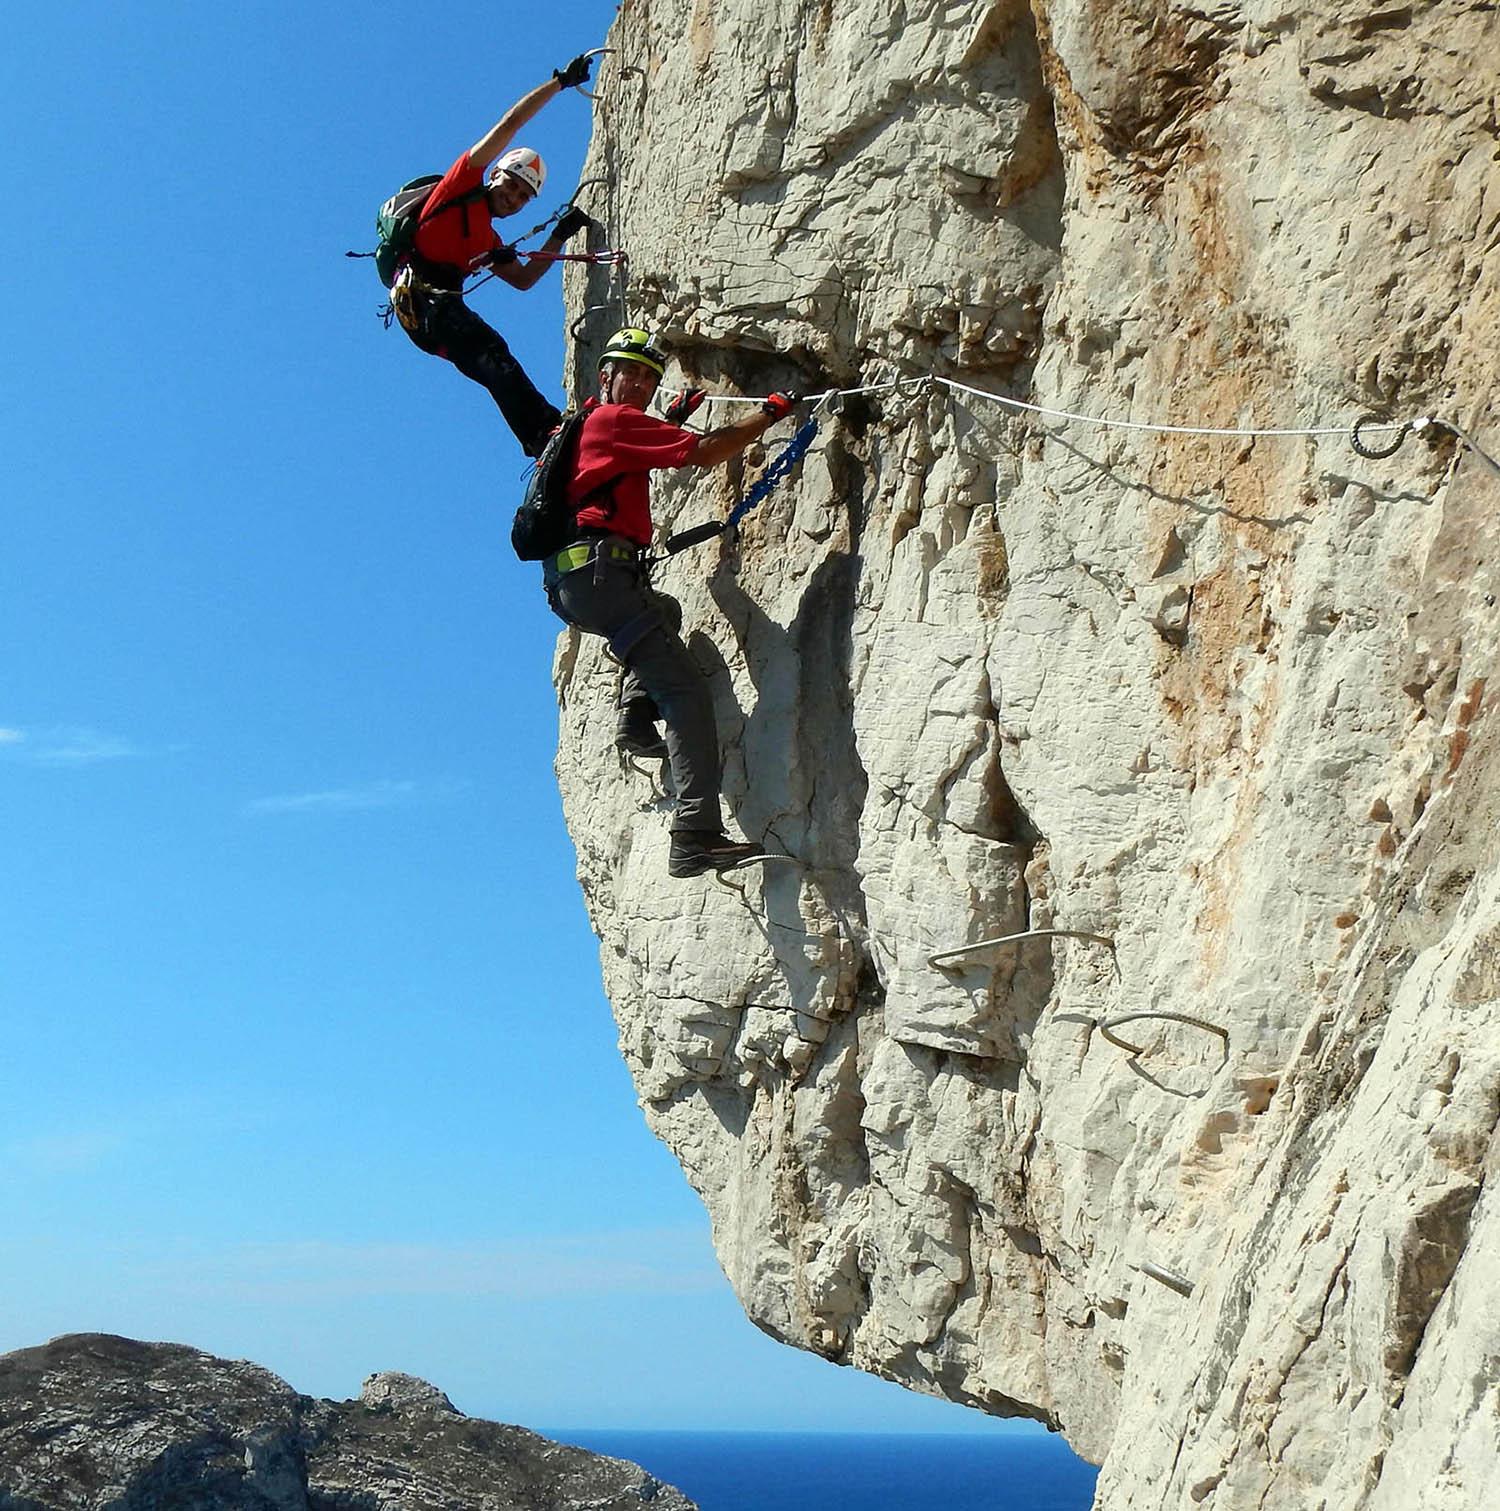 arrampicata sardegna climbing in sardinia